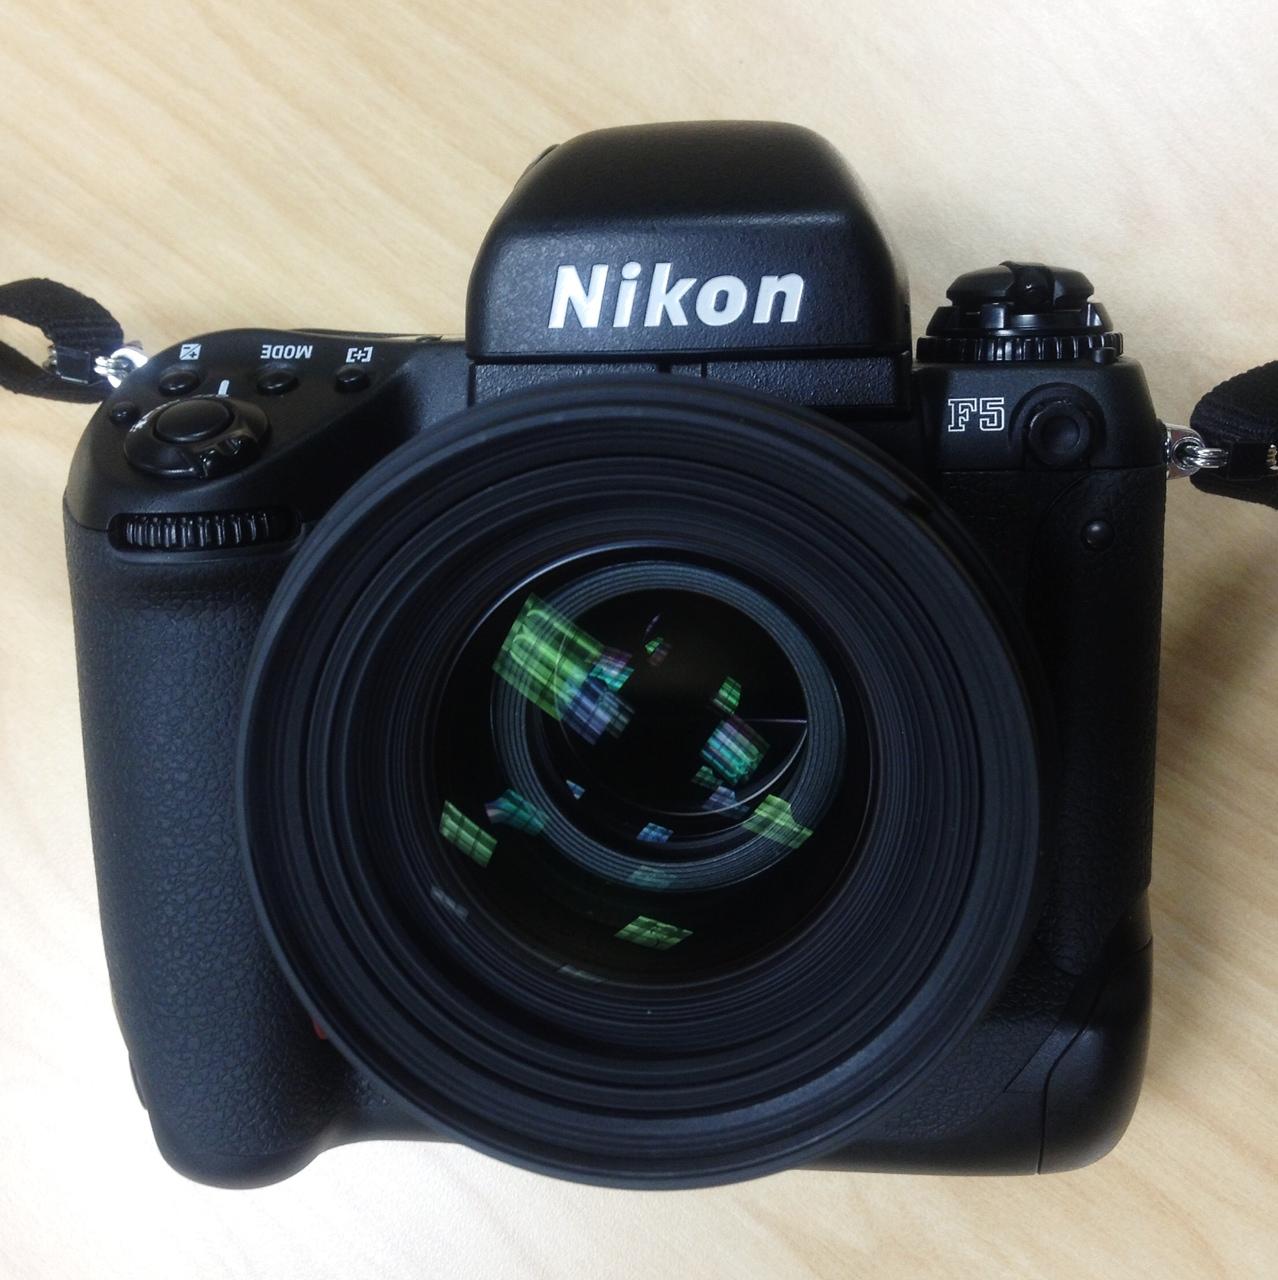 Nikon F5 With Sigma 50mm F1.4 Lens by bensonga in bensonga